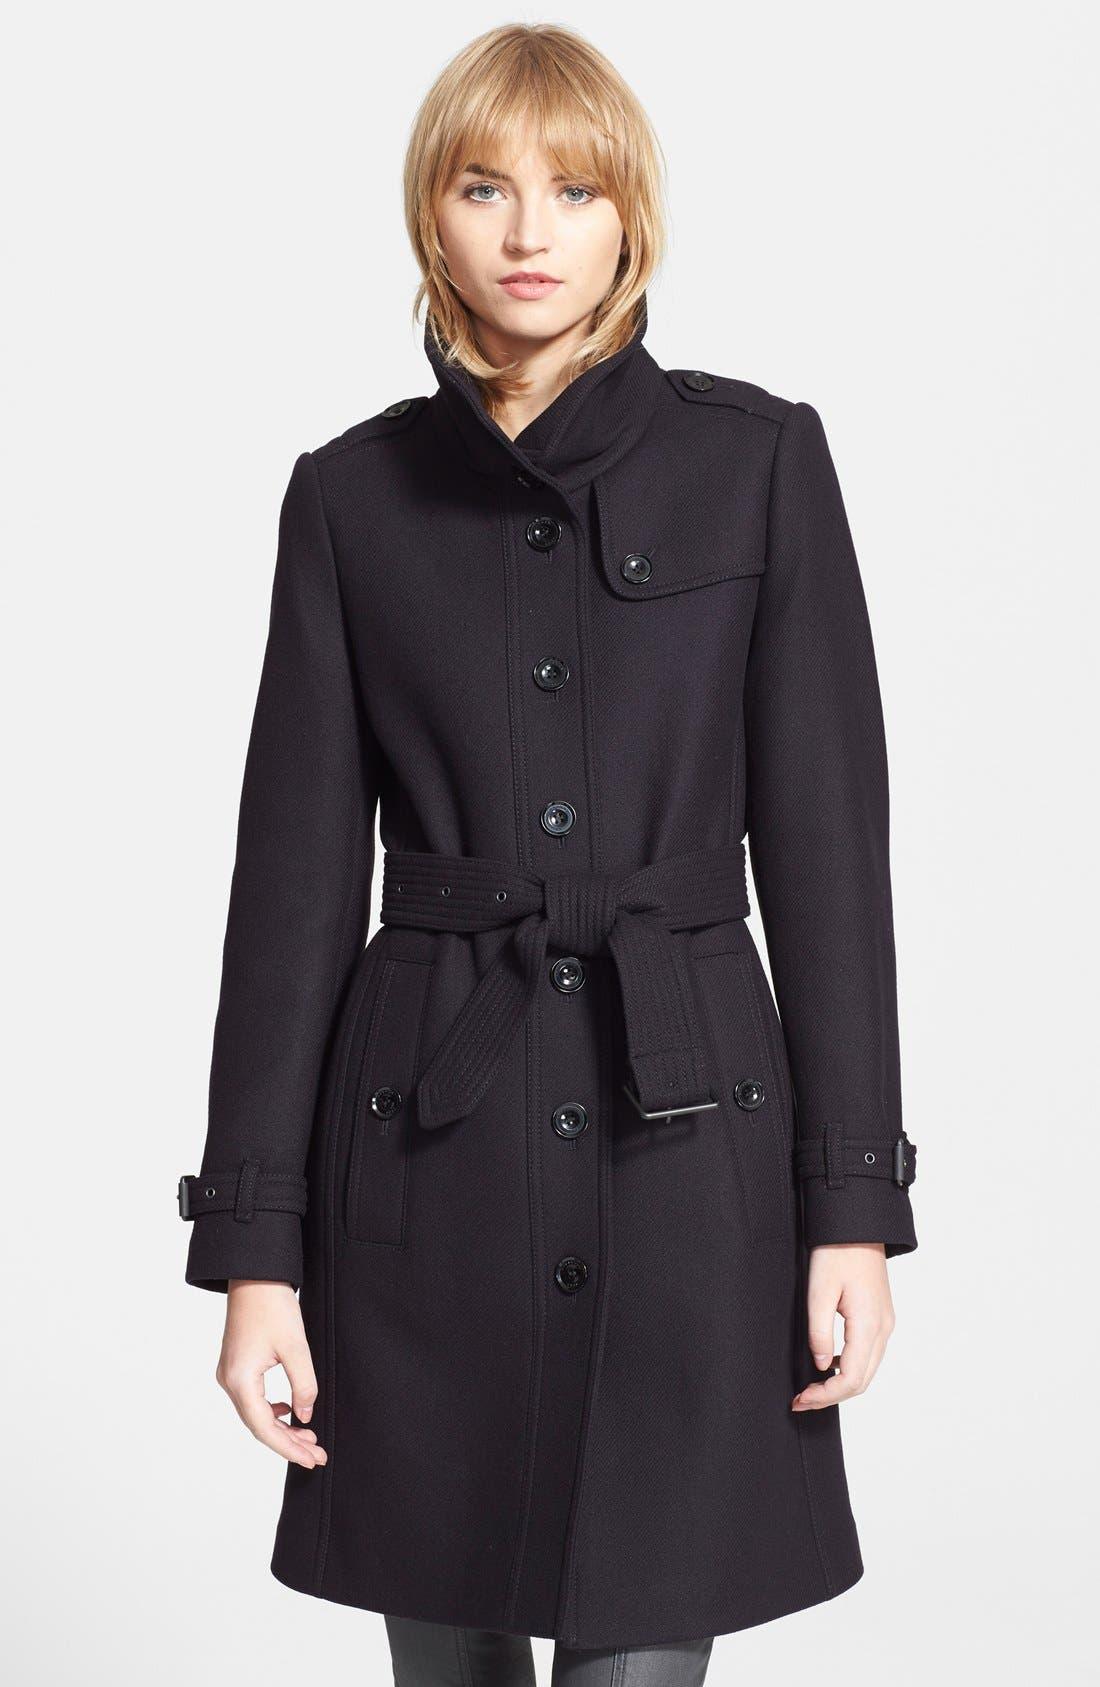 Main Image - Burberry Brit 'Rushfield' Wool Blend Stand Collar Coat